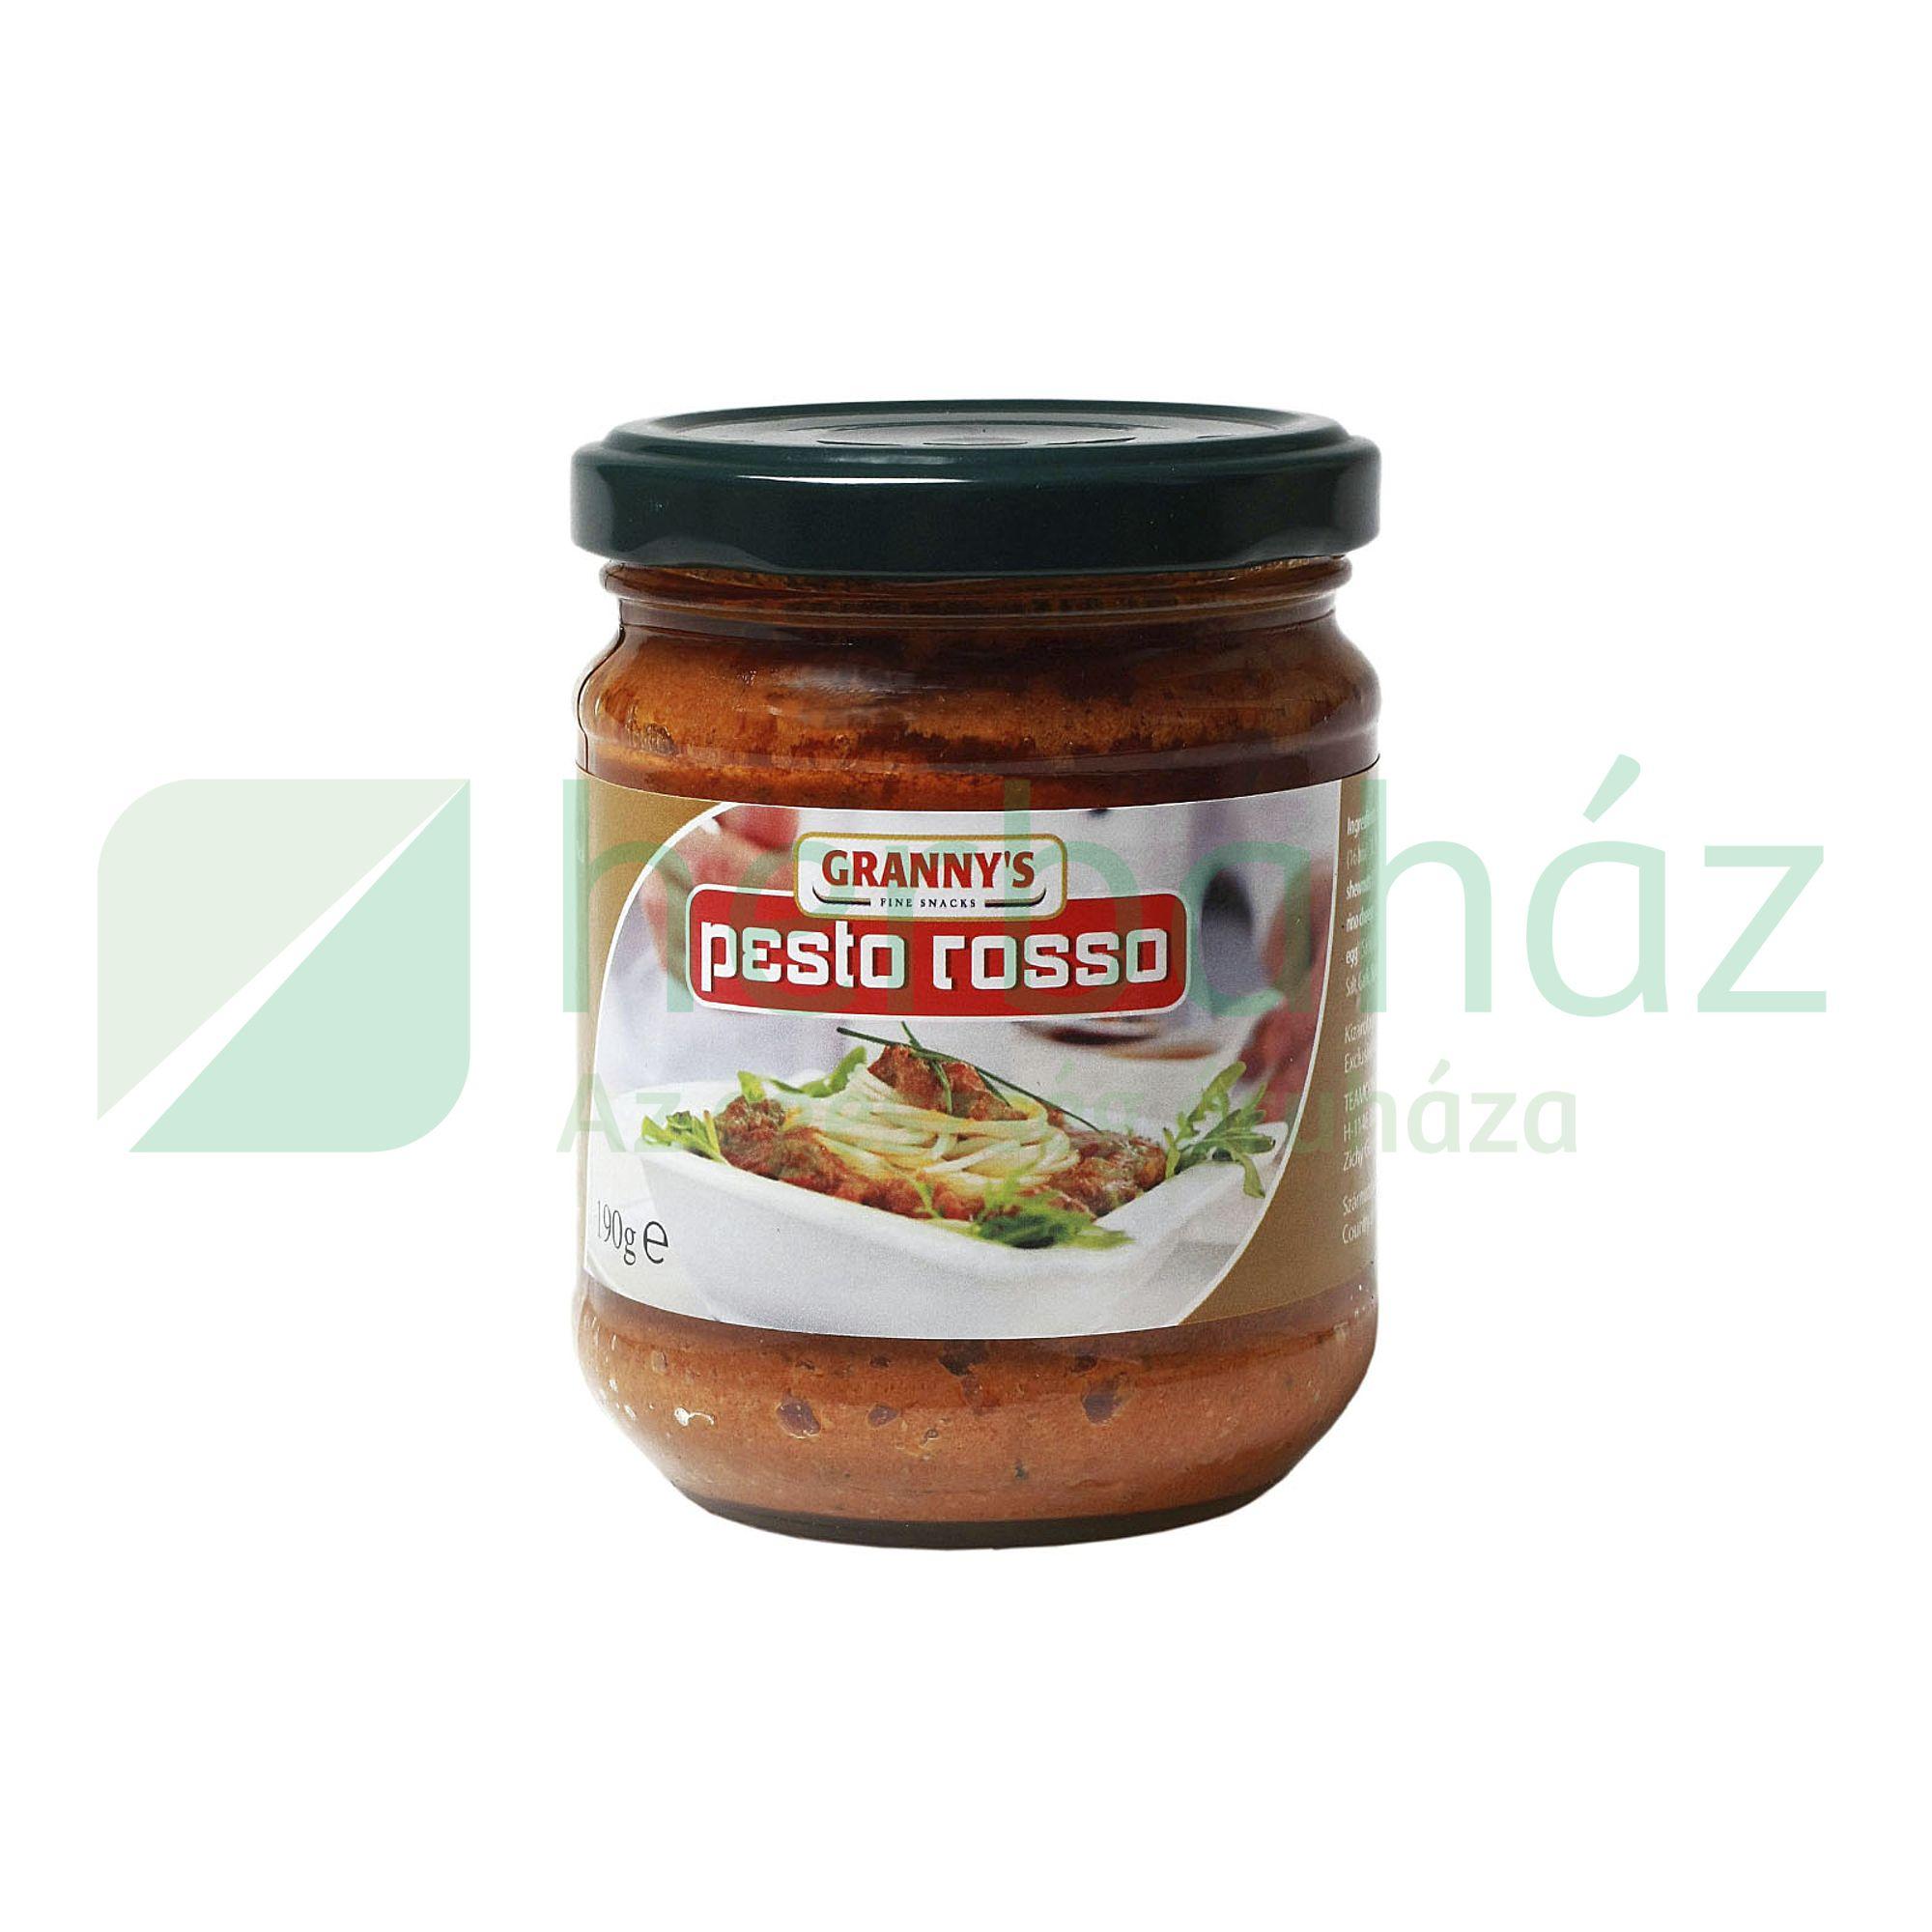 GRANNYS PESTO ROSSO 190G